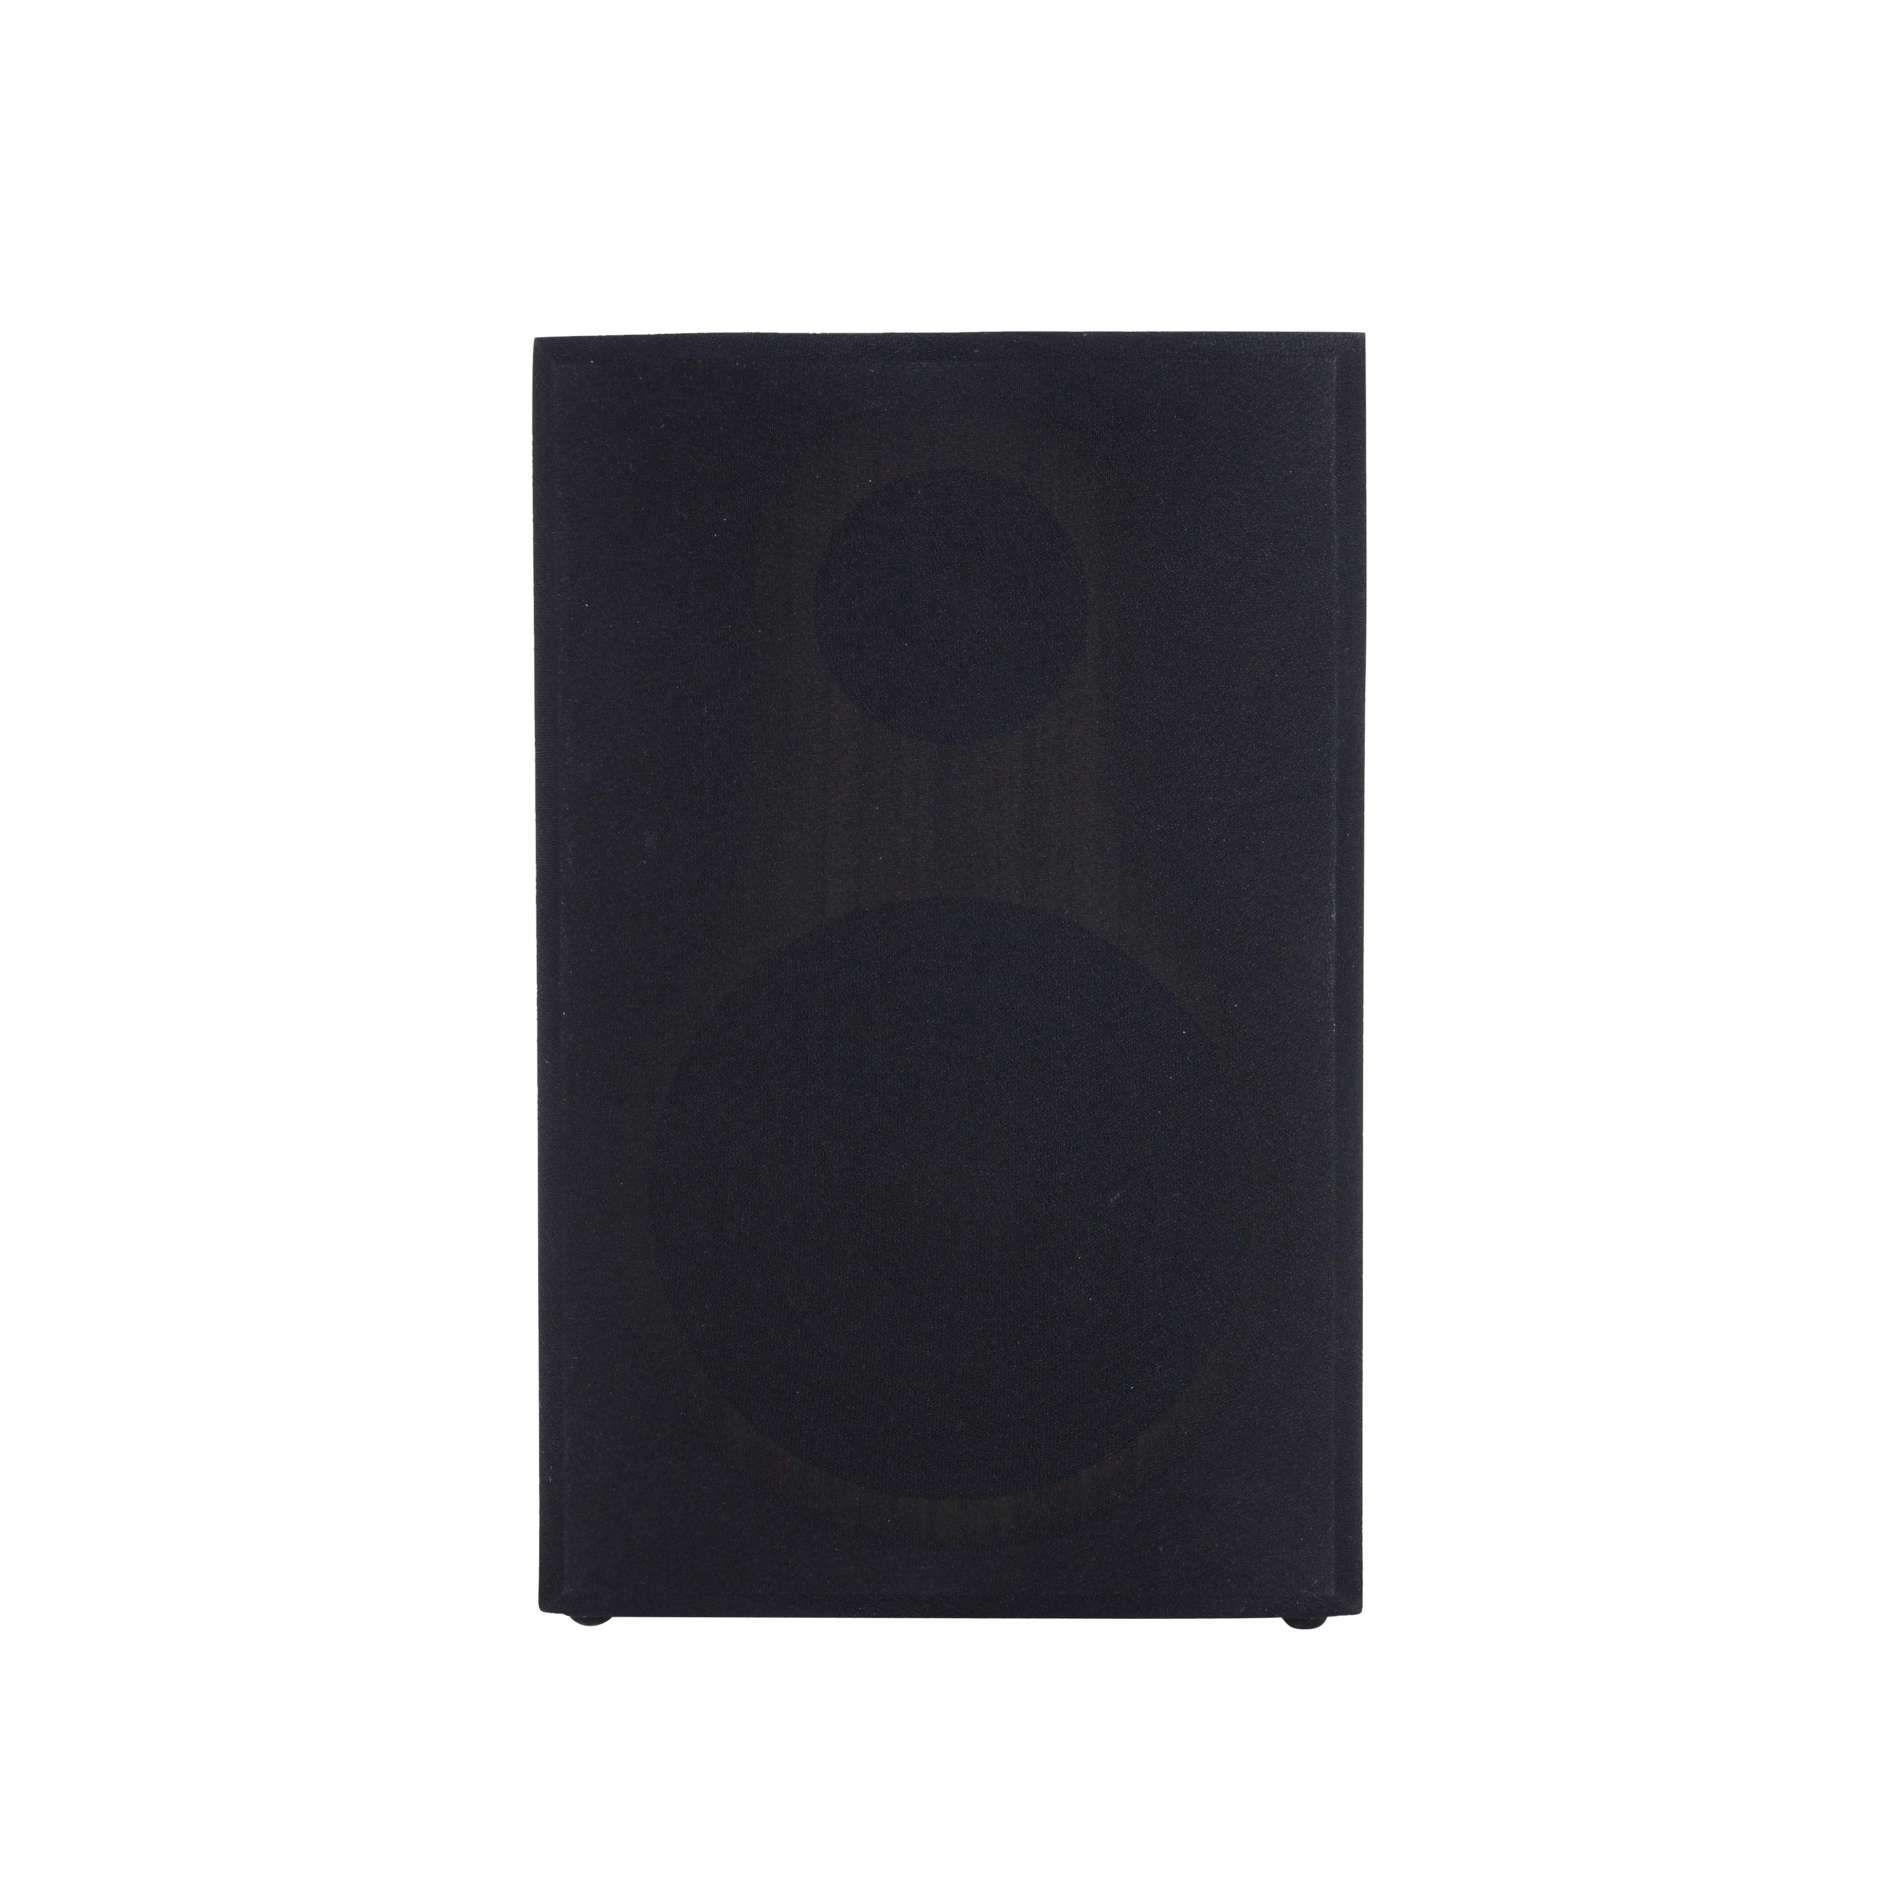 Pack enceintes + vinyle hifi USB/Bluetooth